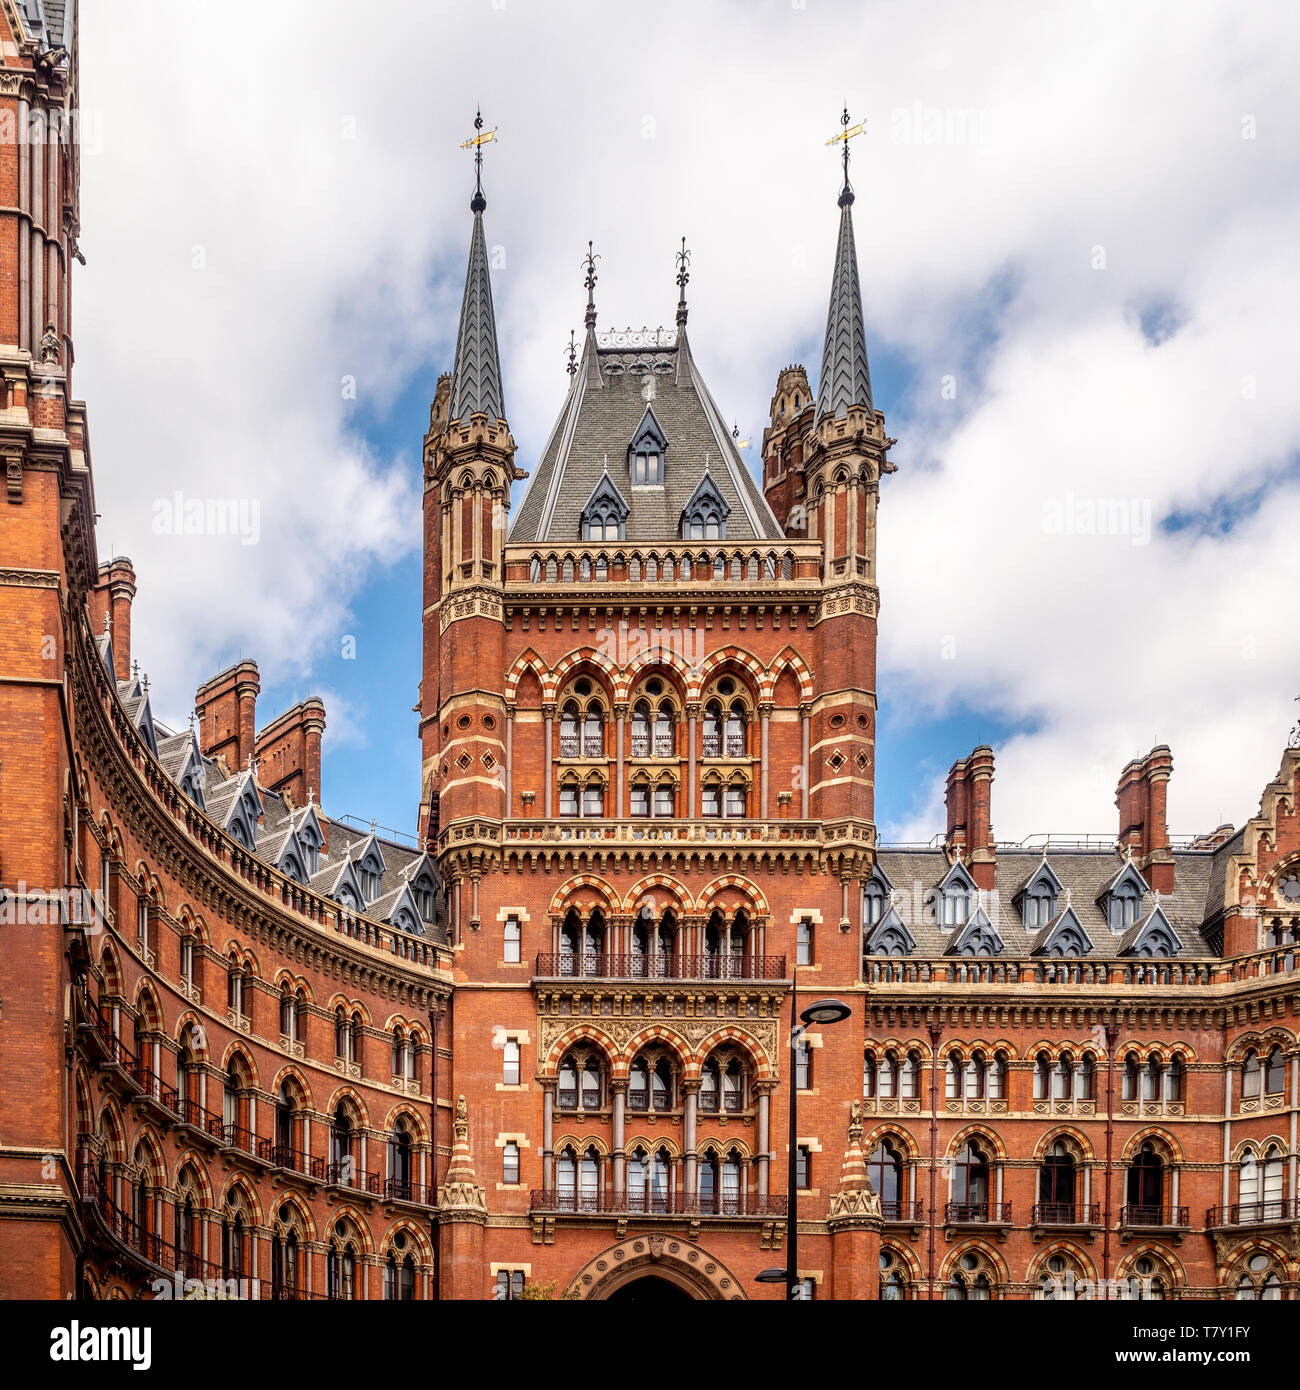 St. Pancras Renaissance Hotel, London, UK - Stock Image